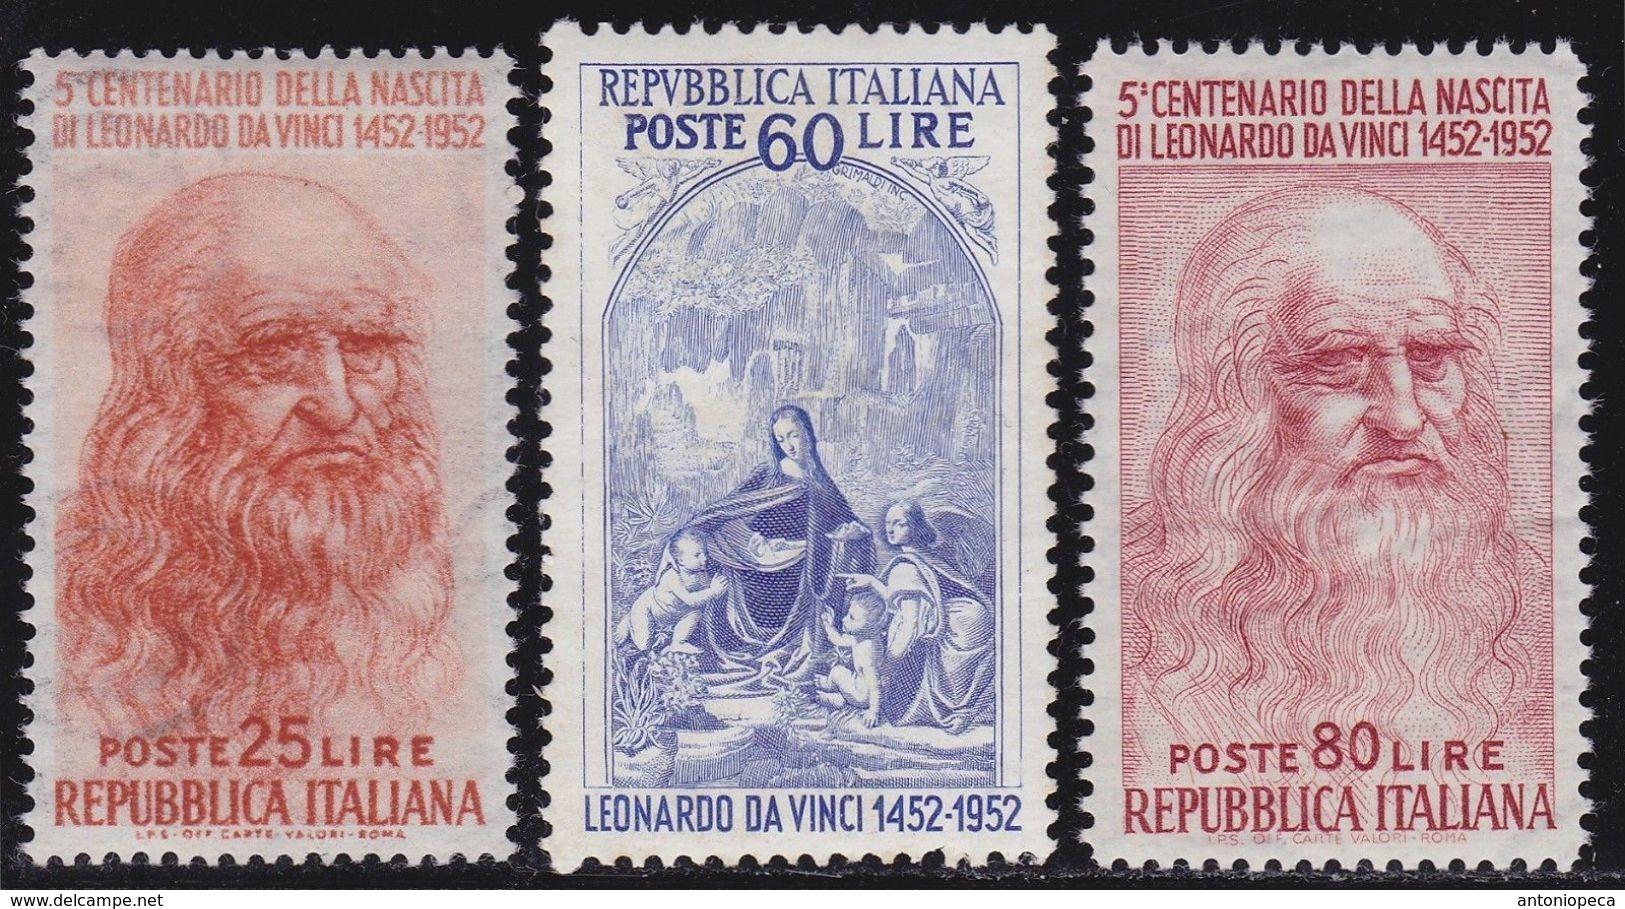 ITALIA 1952 Leonardo Da Vinci Serie Completa 3v Ottima Centratura Nuovi GI  MNH** - 1946-60: Nieuw/plakker